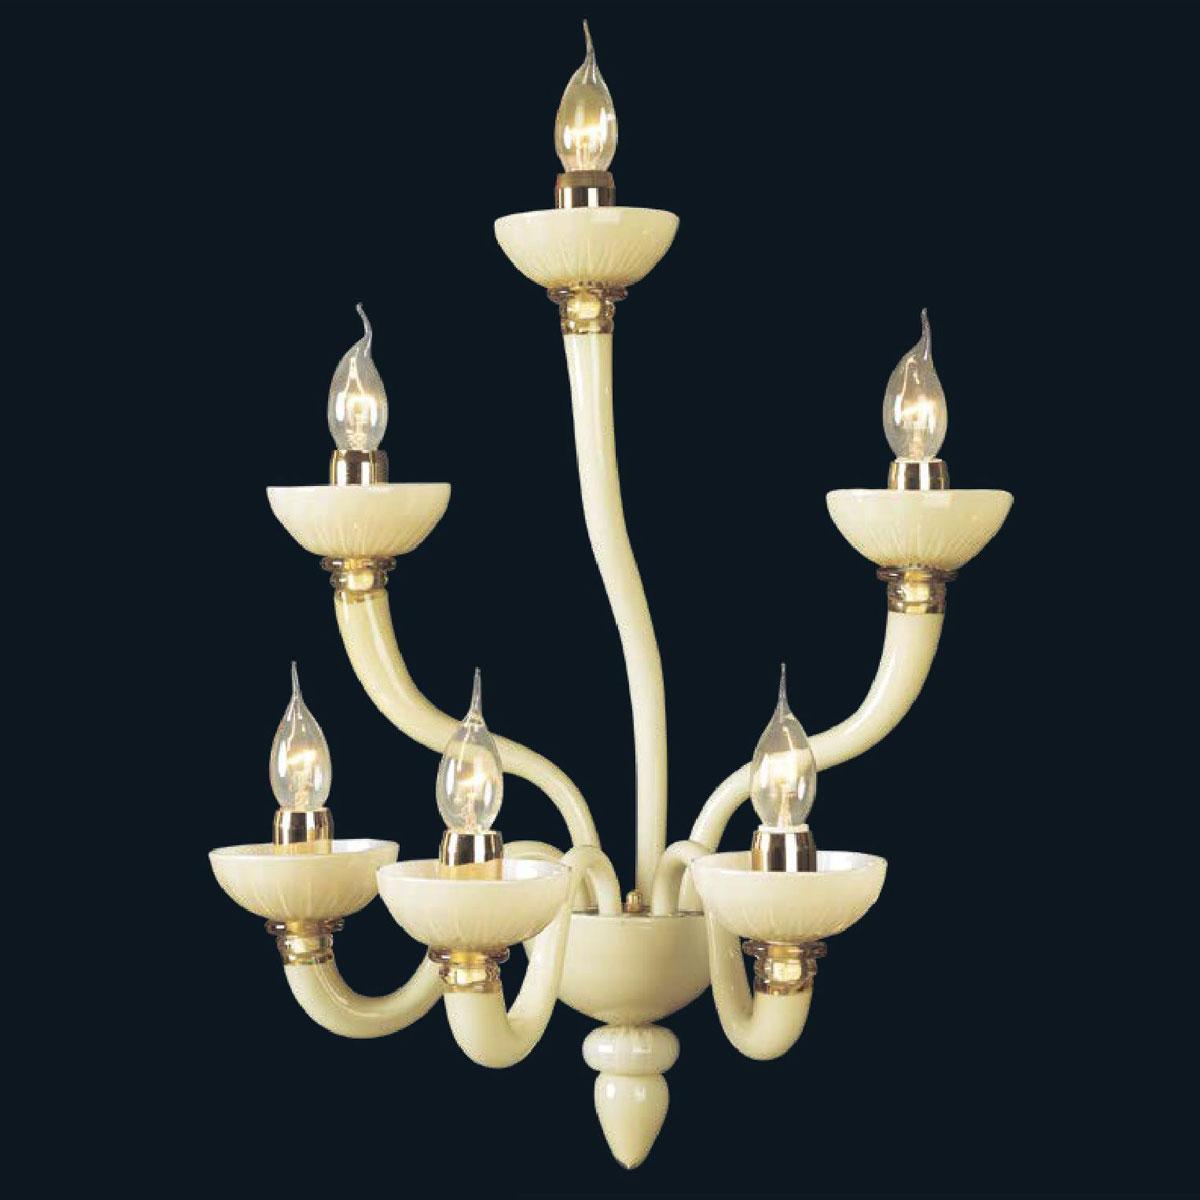 """Fateh"" Murano glas wandleuchte - 3+2+1 flammig - weiß"